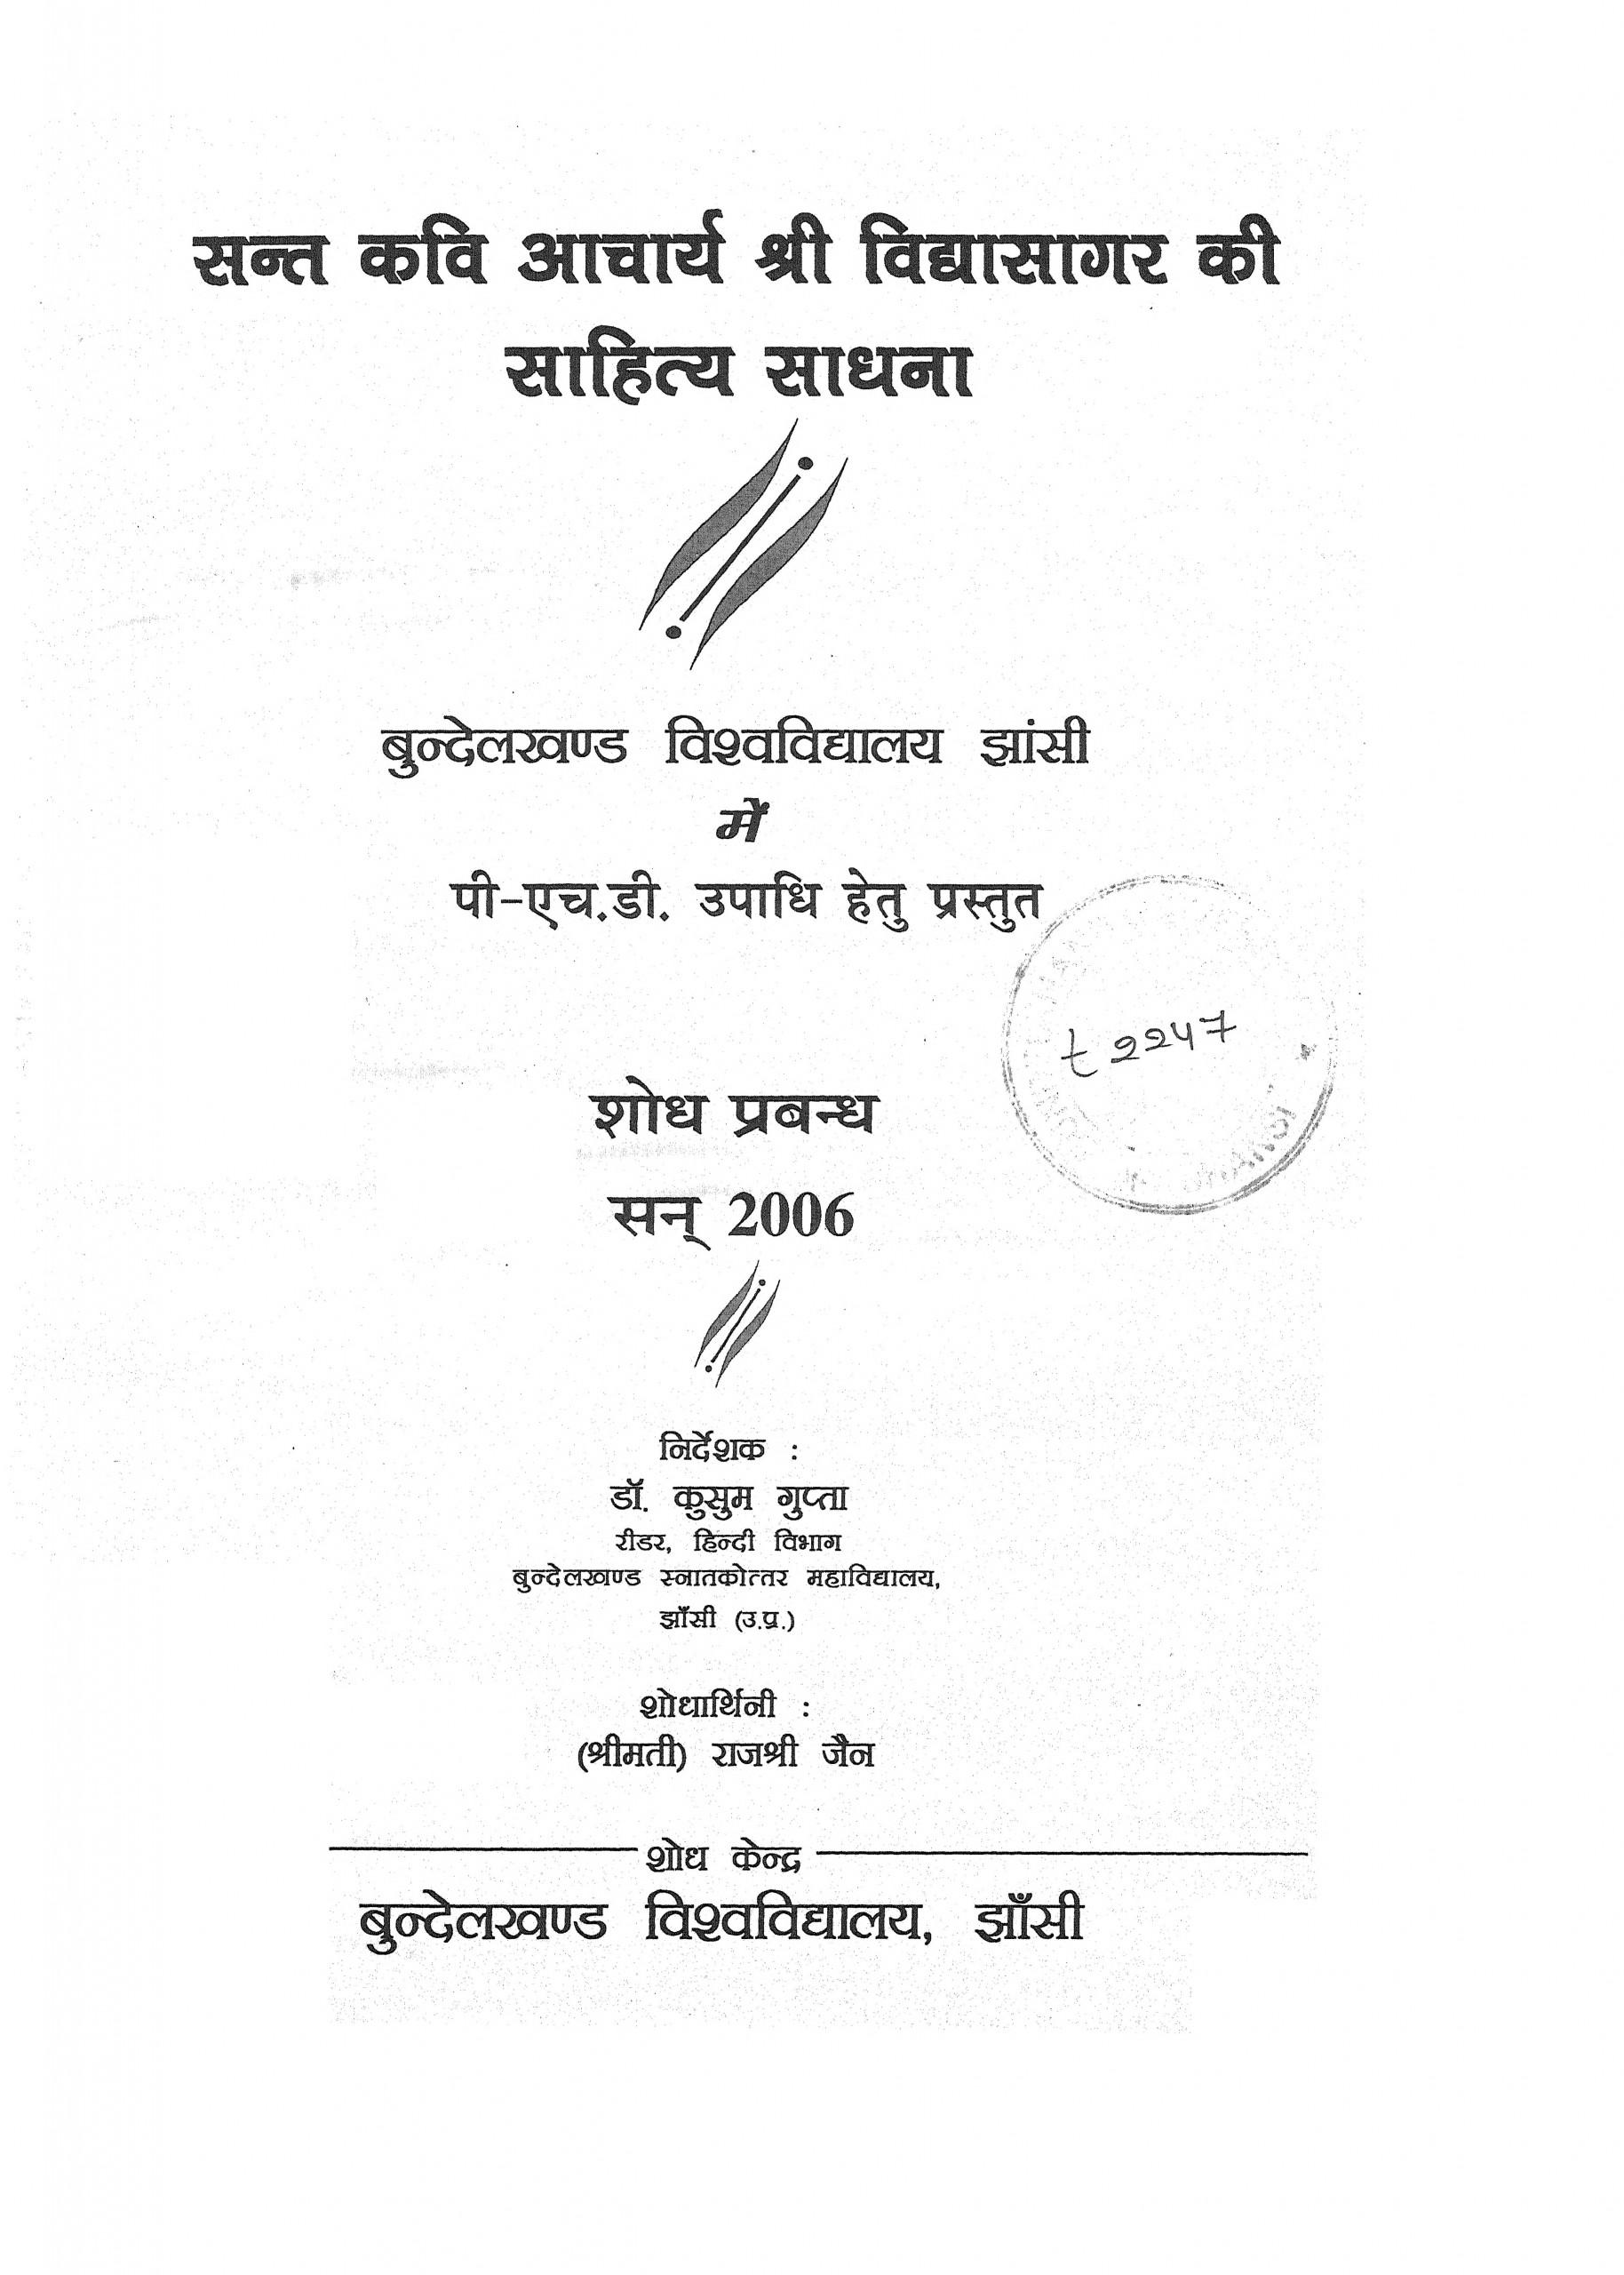 Book Image : सन्त कवि आचार्य श्री विद्यासागर की साहित्य साधना - Sant Kavi Acharya Shree Vidhyasagar Ki Sahitya Sadhna